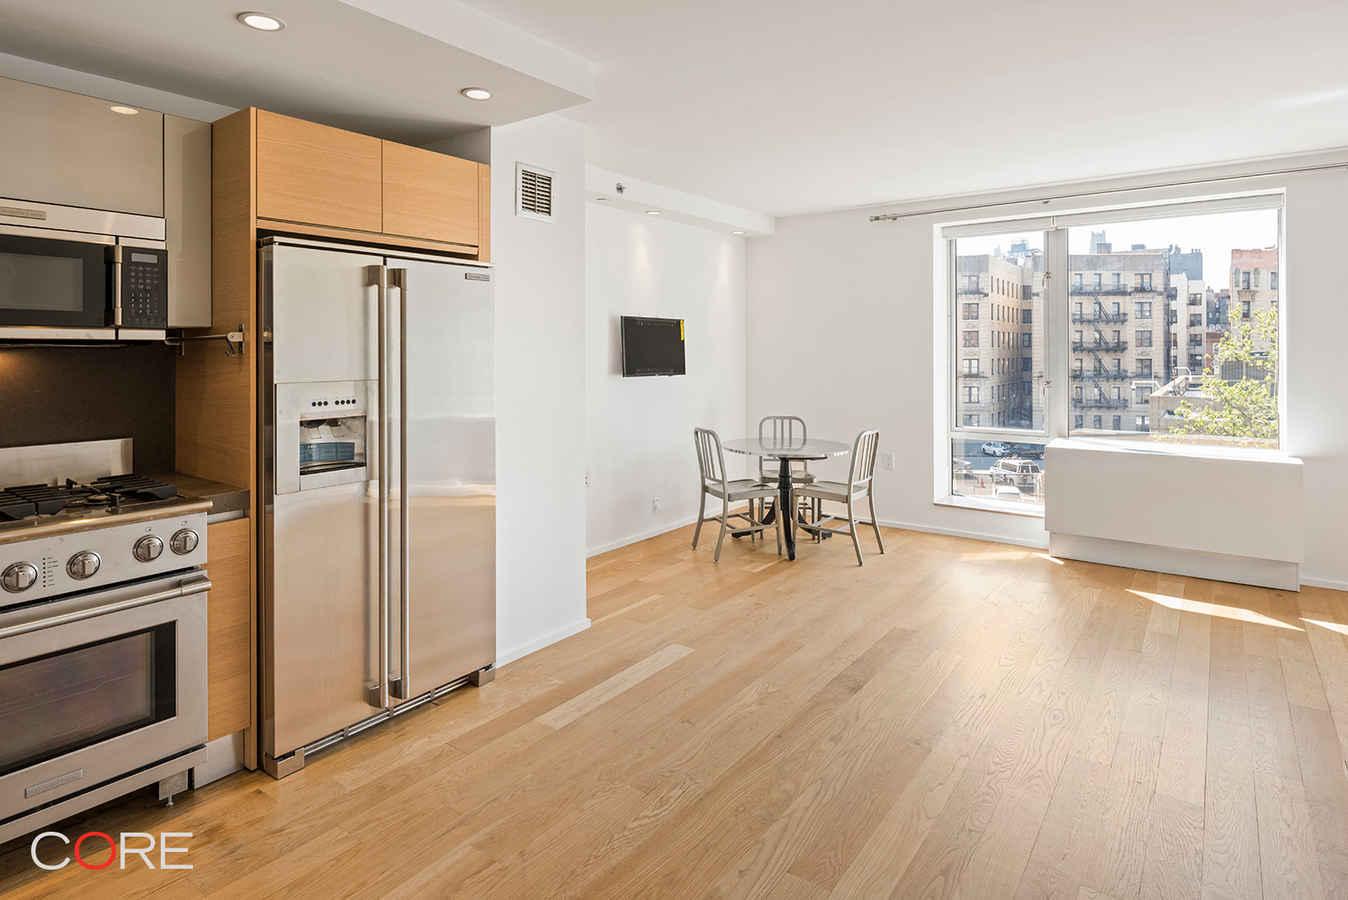 Apartment for sale at 2280 Frederick Douglass Blvd., Apt 3F